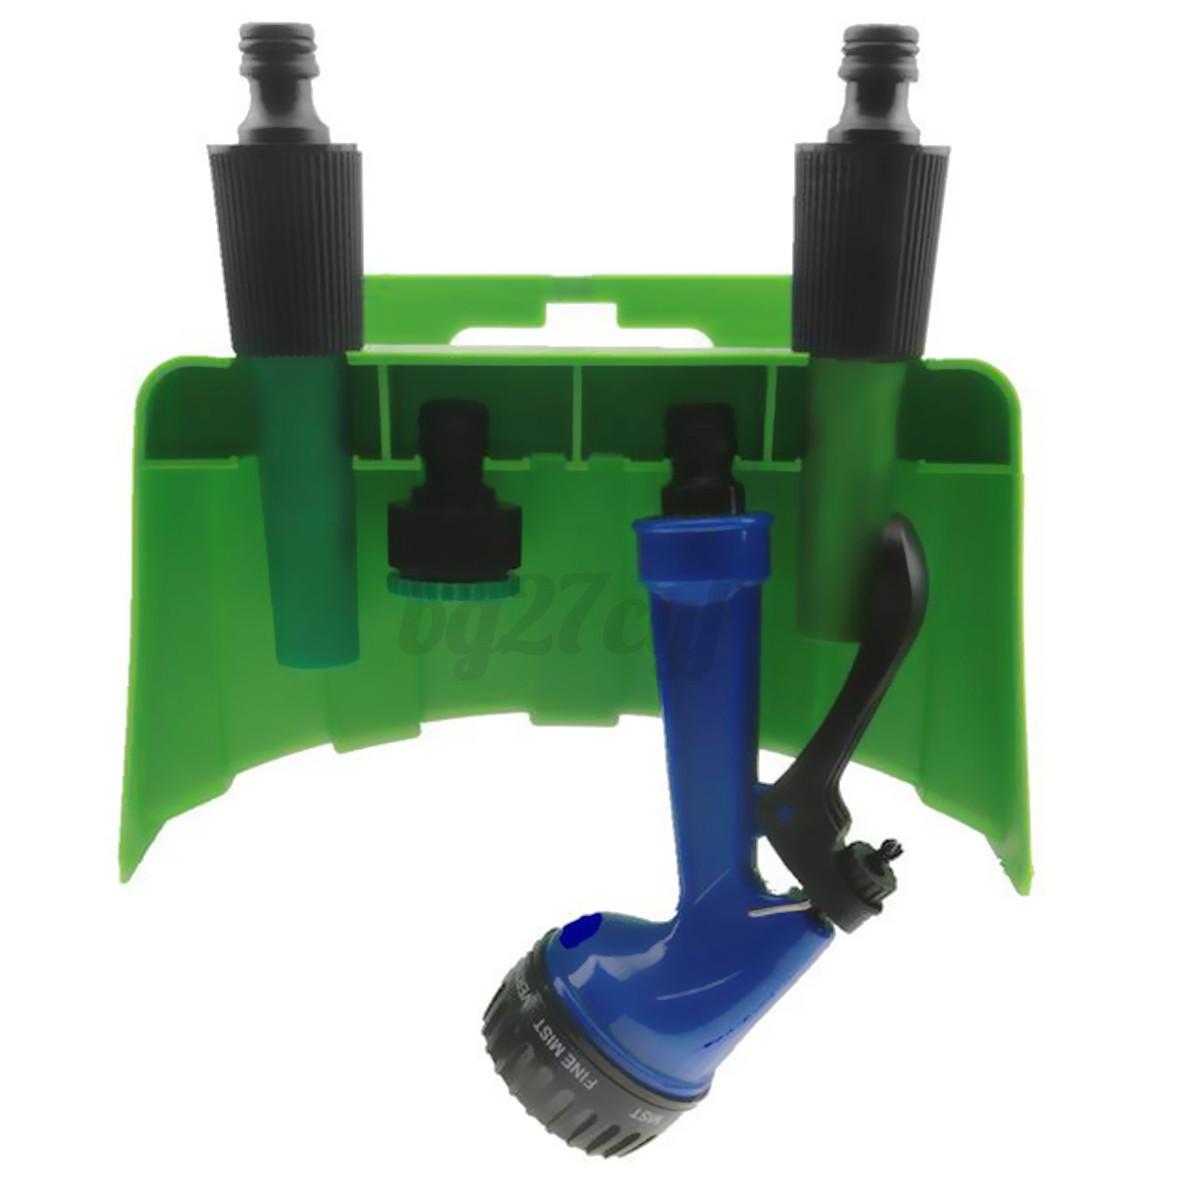 Wall mounted tap hose pipe hanger reel storage holder